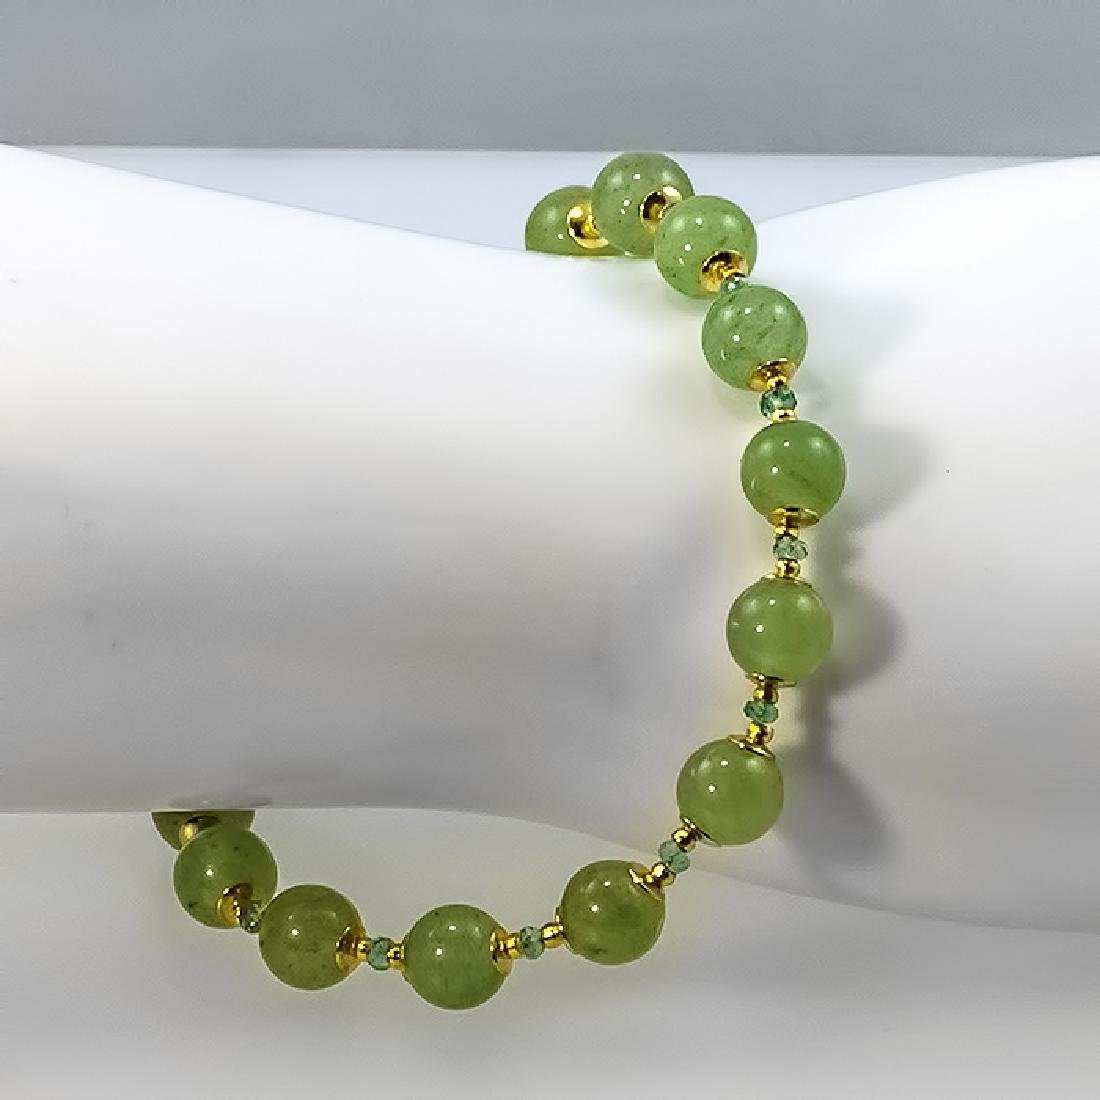 Nephrite and Emeralds 1.55ctw Bracelet